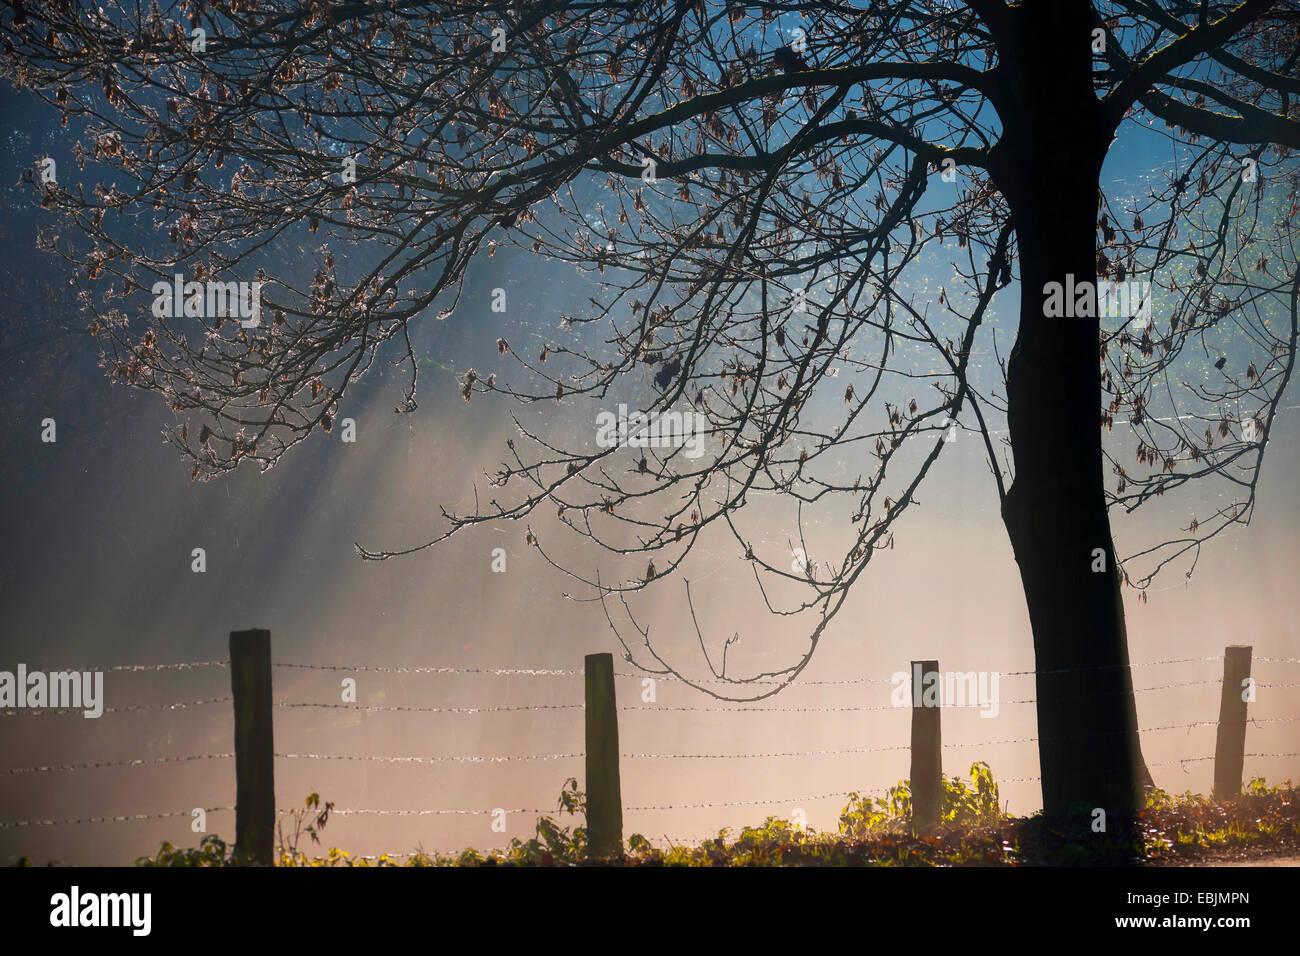 fog and silhouette of a tree waysides, Germany, North Rhine-Westphalia, Baumberge - Stock Image